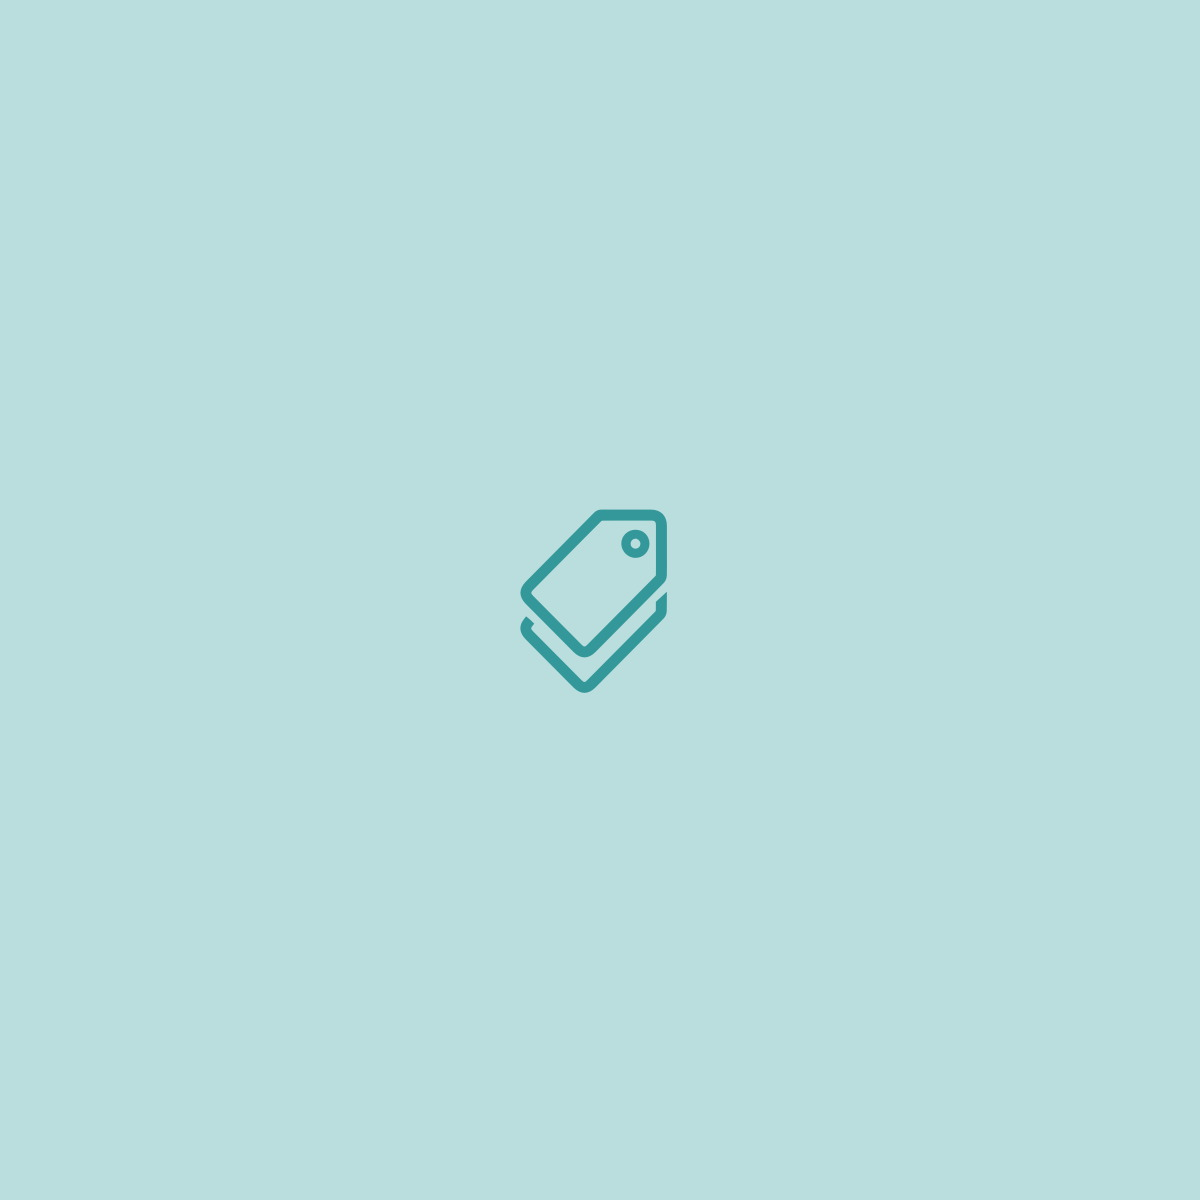 Quadro Abstrato Azul Turquesa E Marrom 55×100 Atelier Valverde  ~ Escritorio No Quarto De Casal E Quarto Casal Azul Tiffany